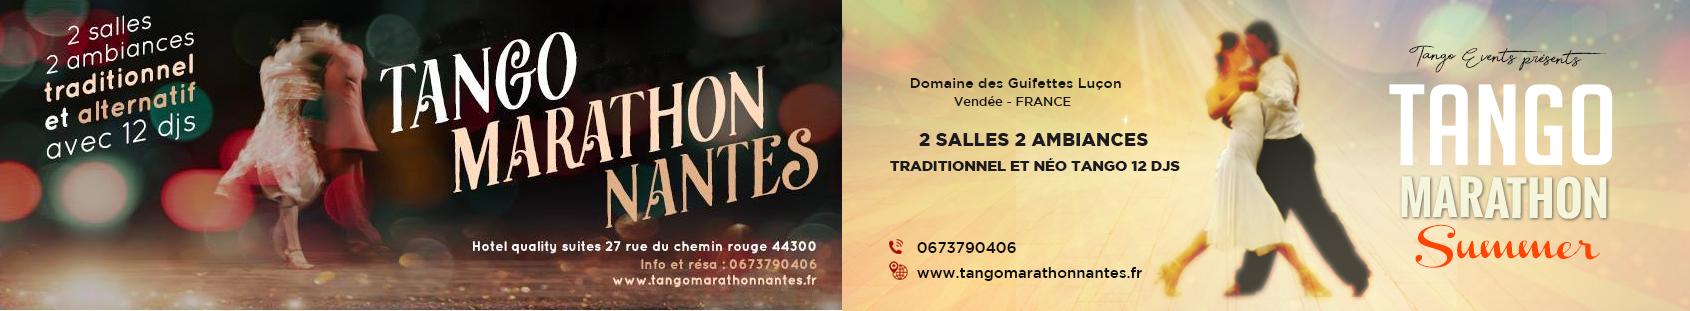 Tango Marathon Nantes 2021 du 22 au 24 janvier ......... Tango Marathon Summer 2020 du 5 au 8 juin